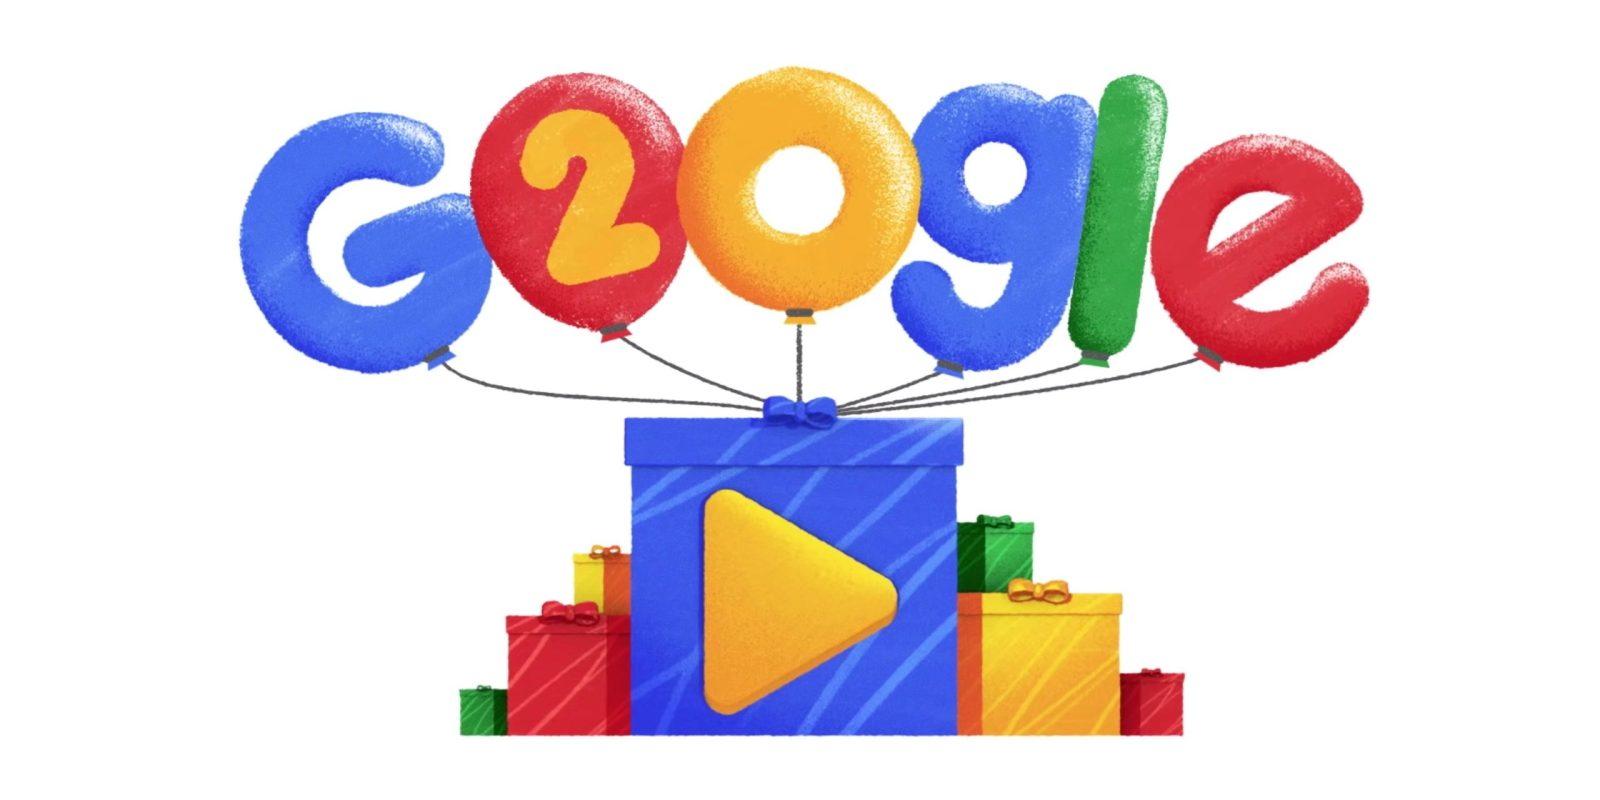 google-doodle-20th-birthday